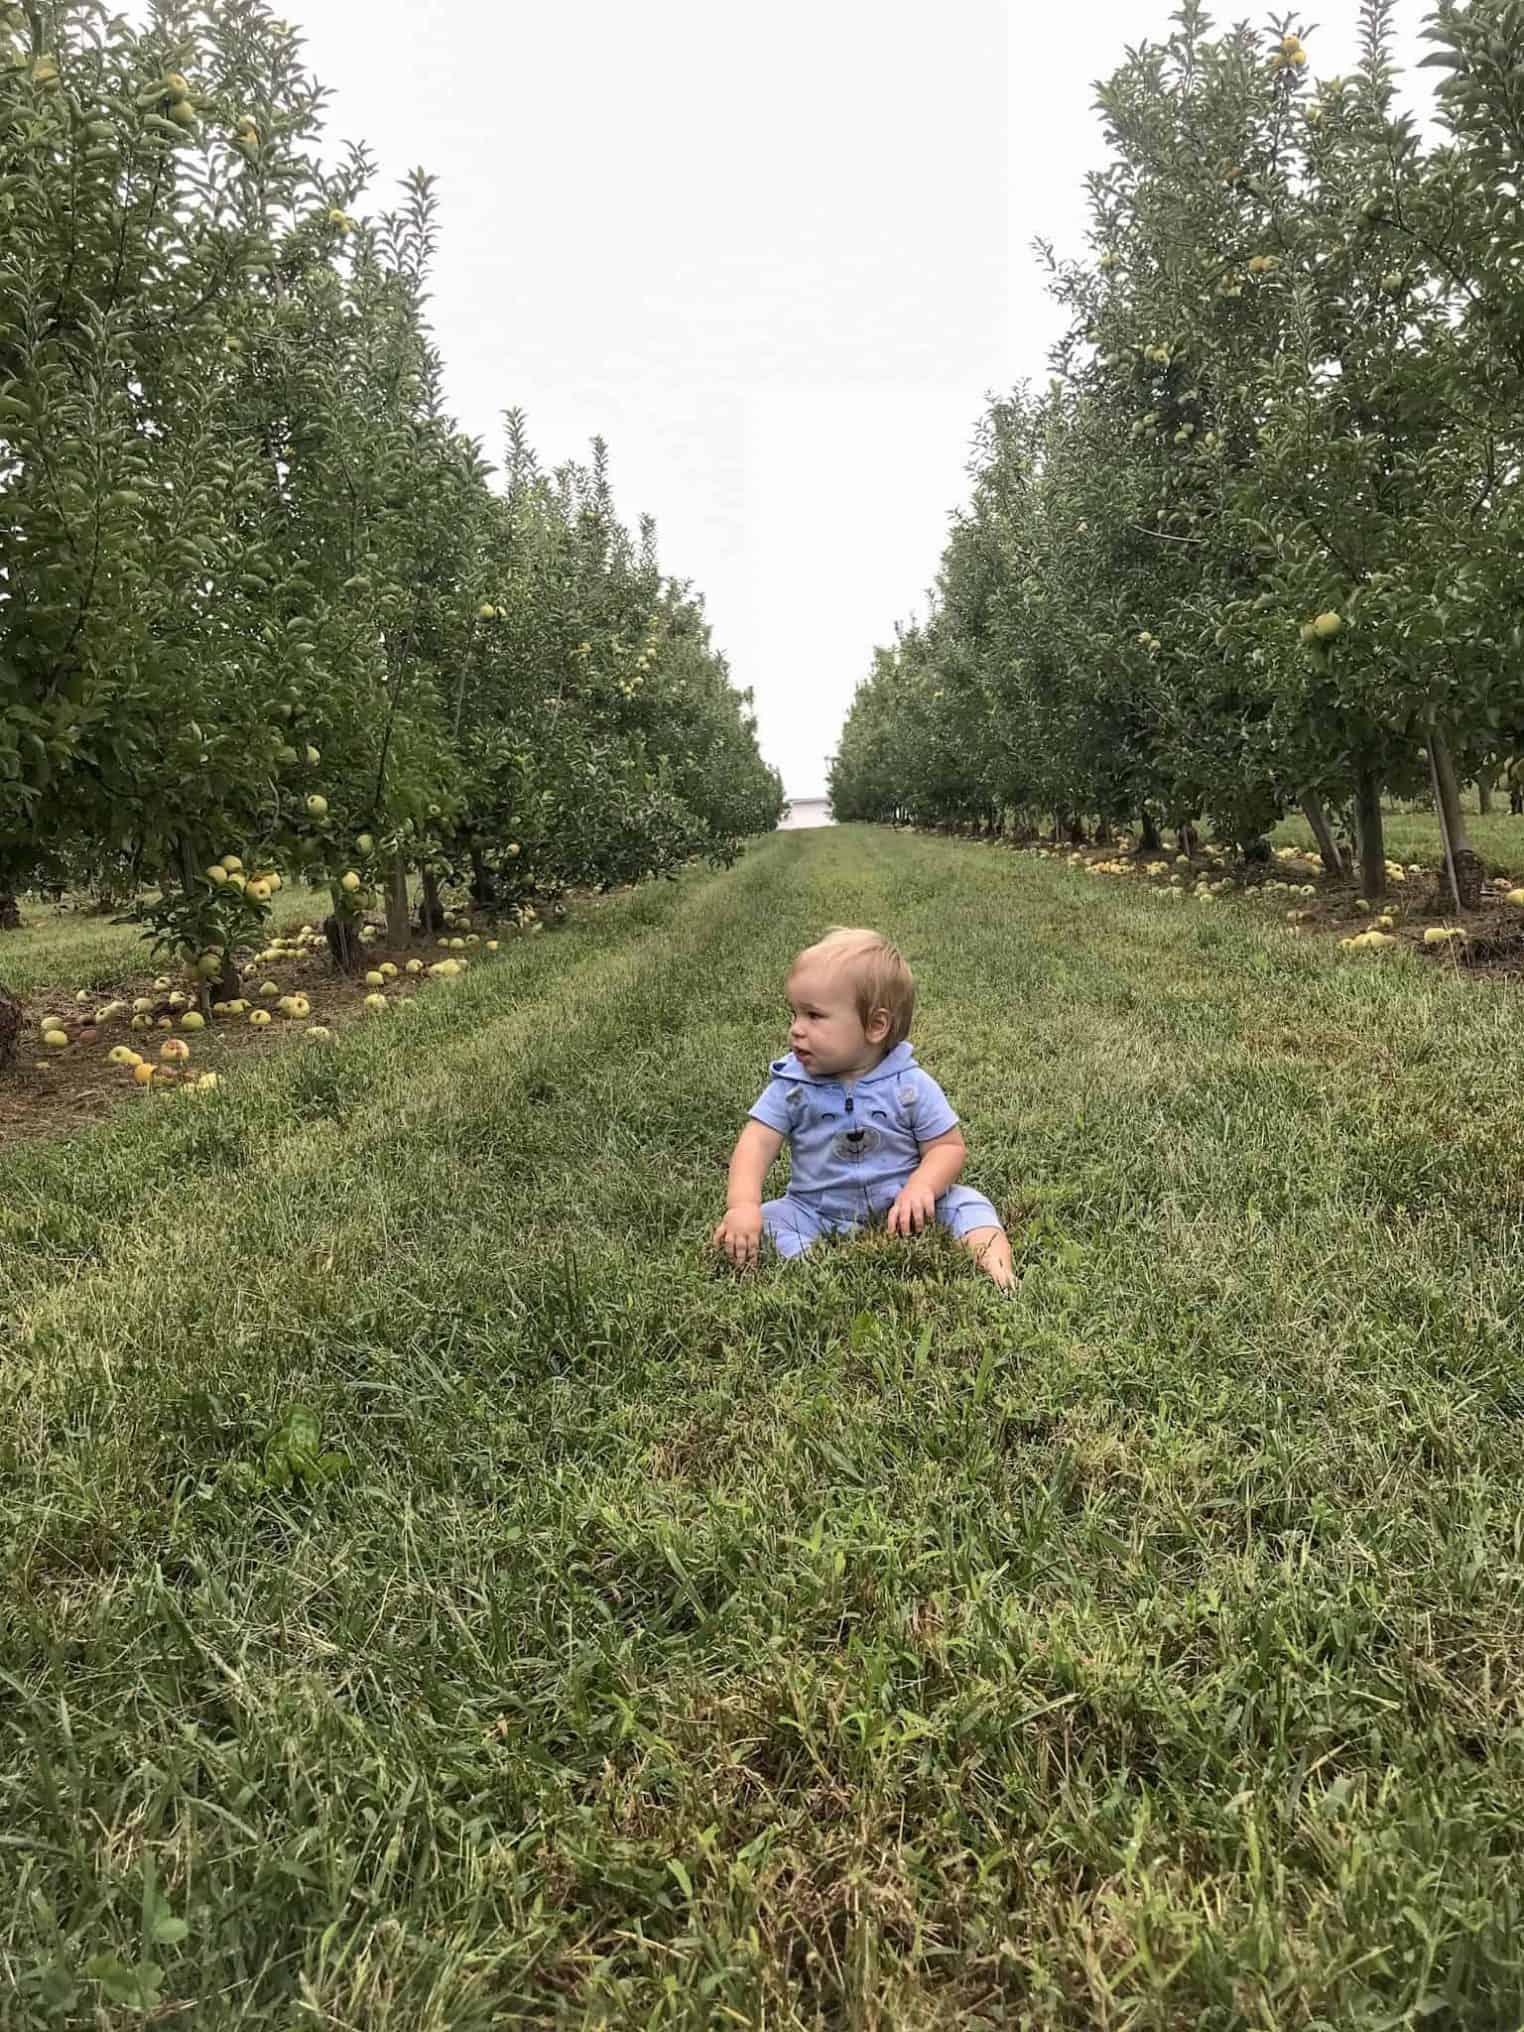 Picking apples at Eckert's farm in Belleville, IL